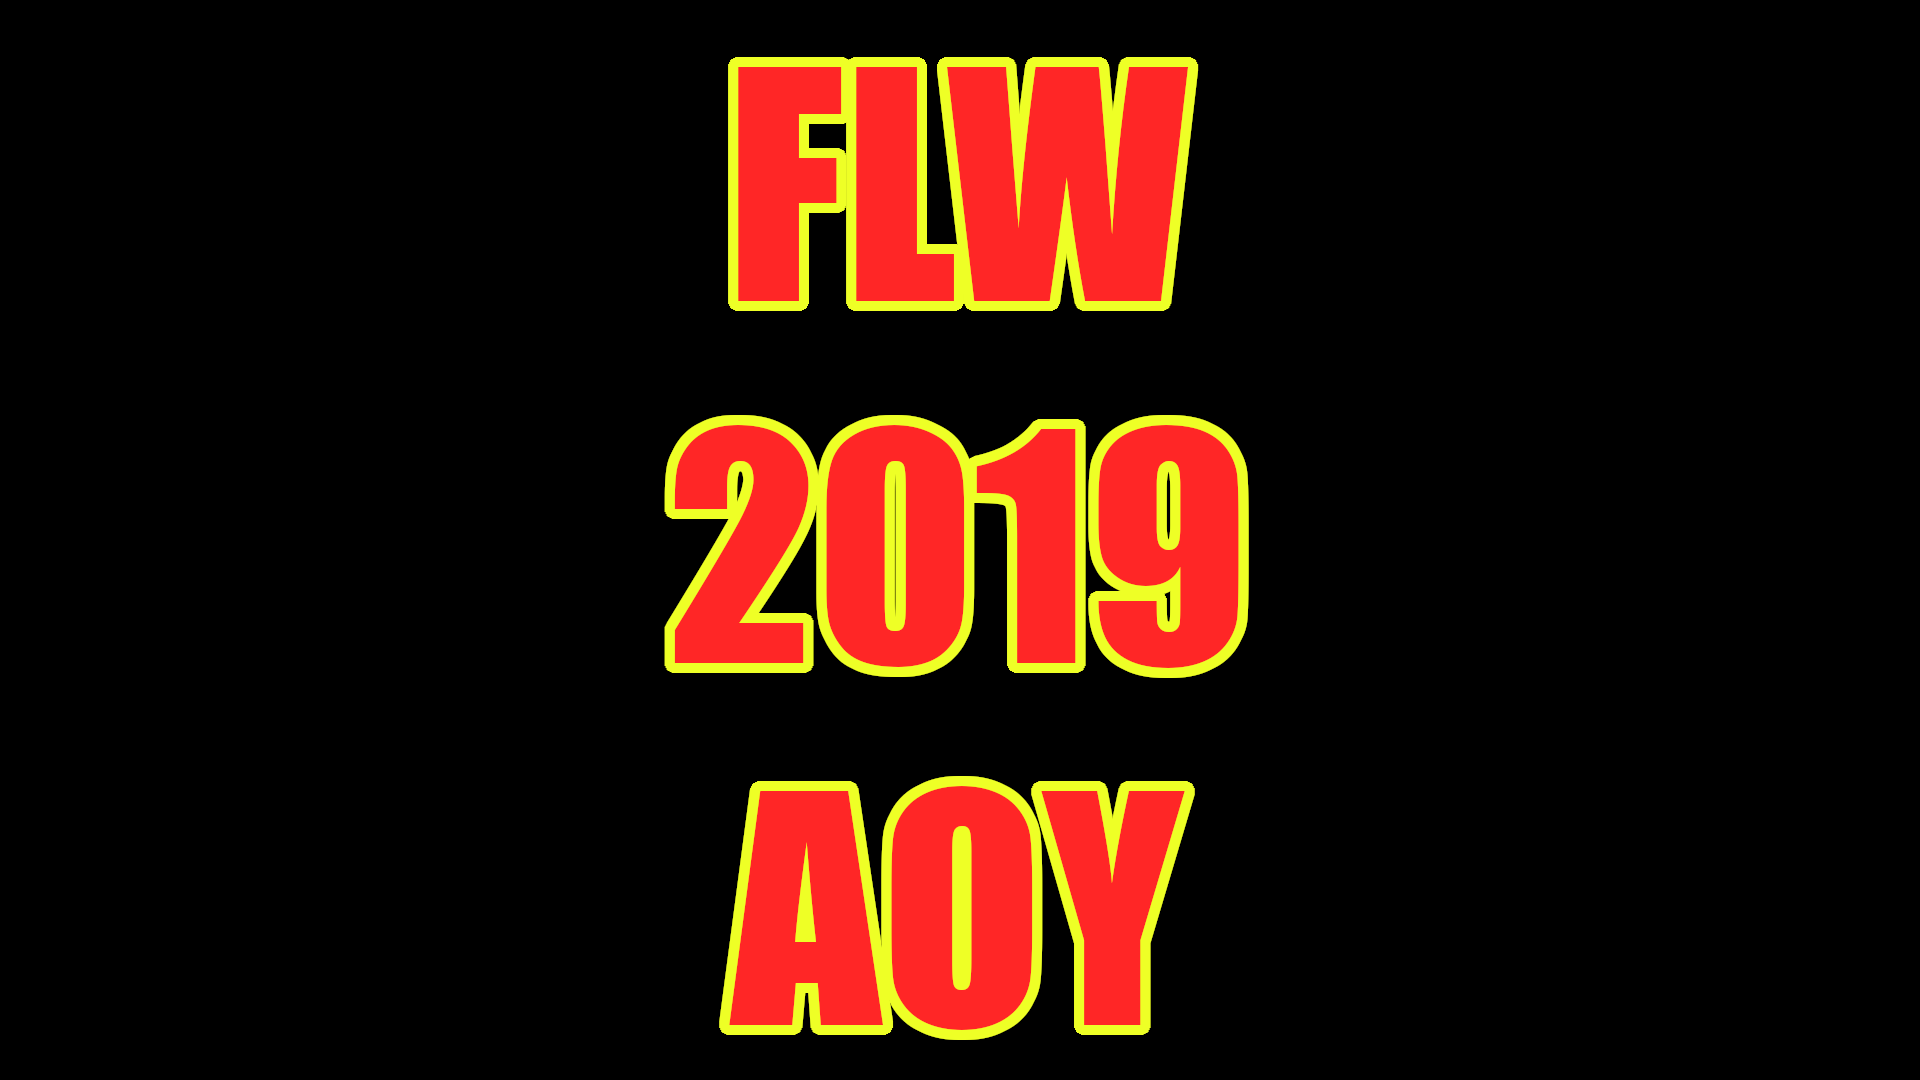 FLW2019アングラ―オブザイヤー